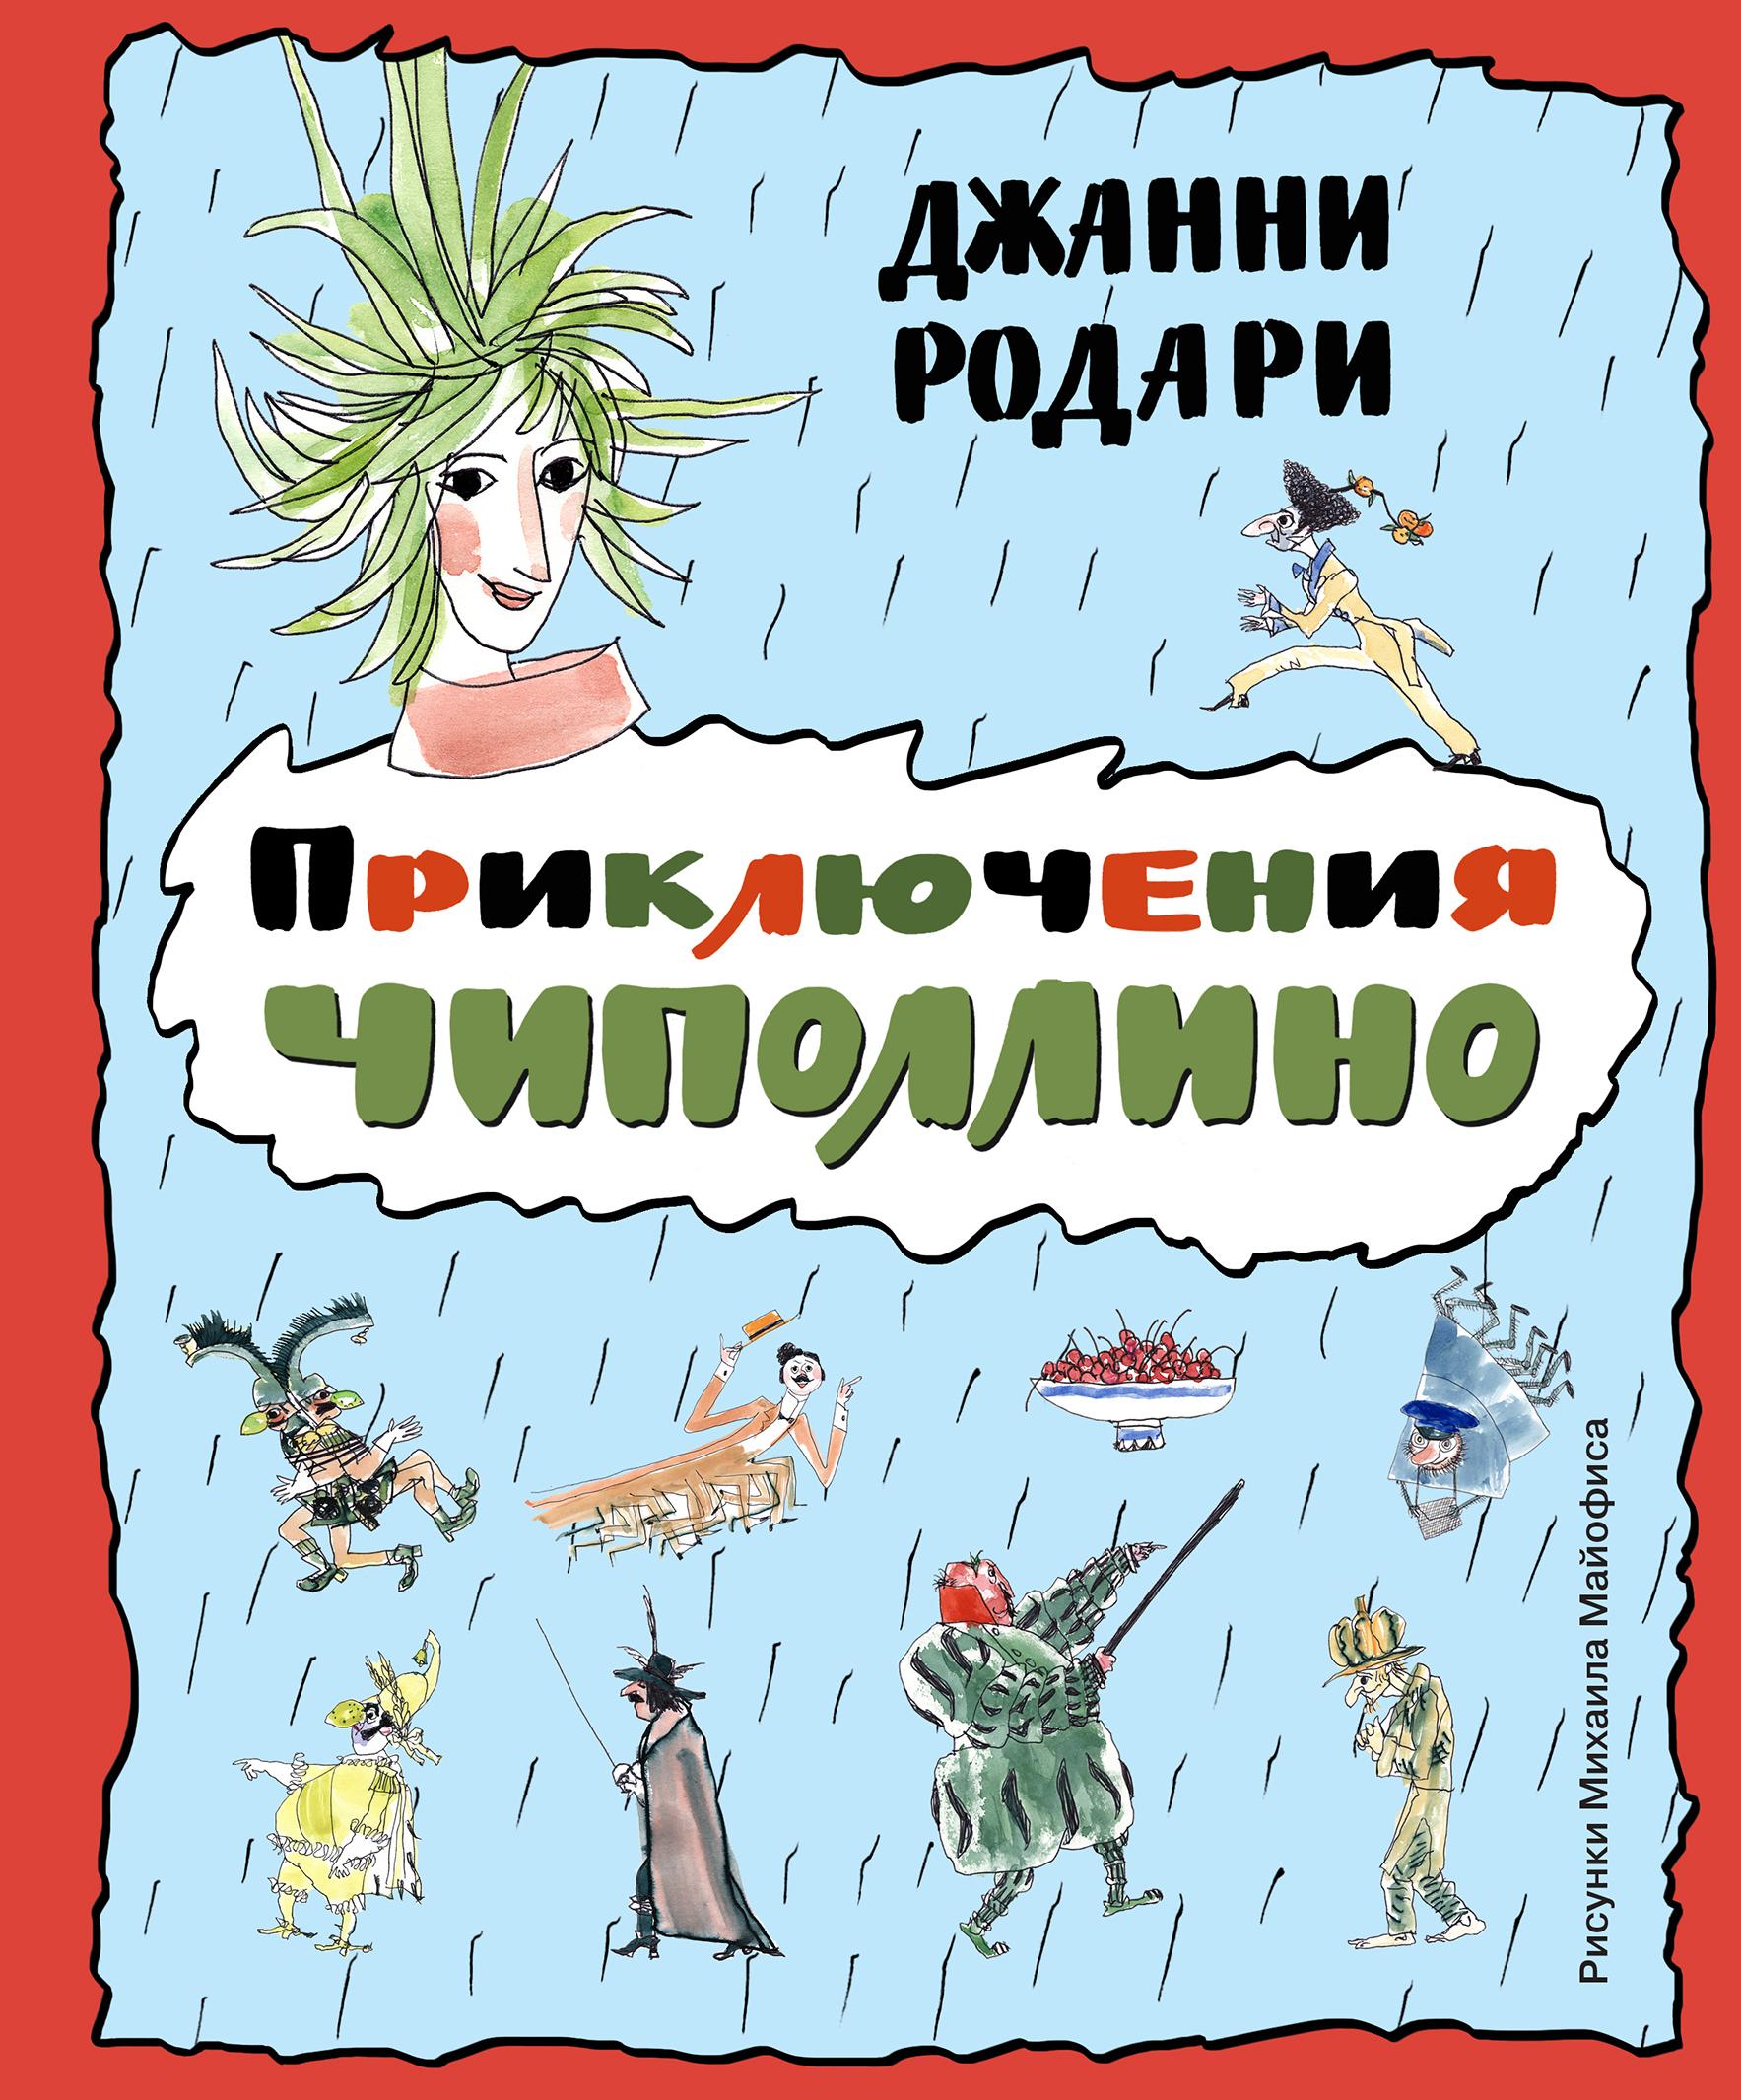 Джанни Родари Приключения Чиполлино (ил. М. Майофиса)